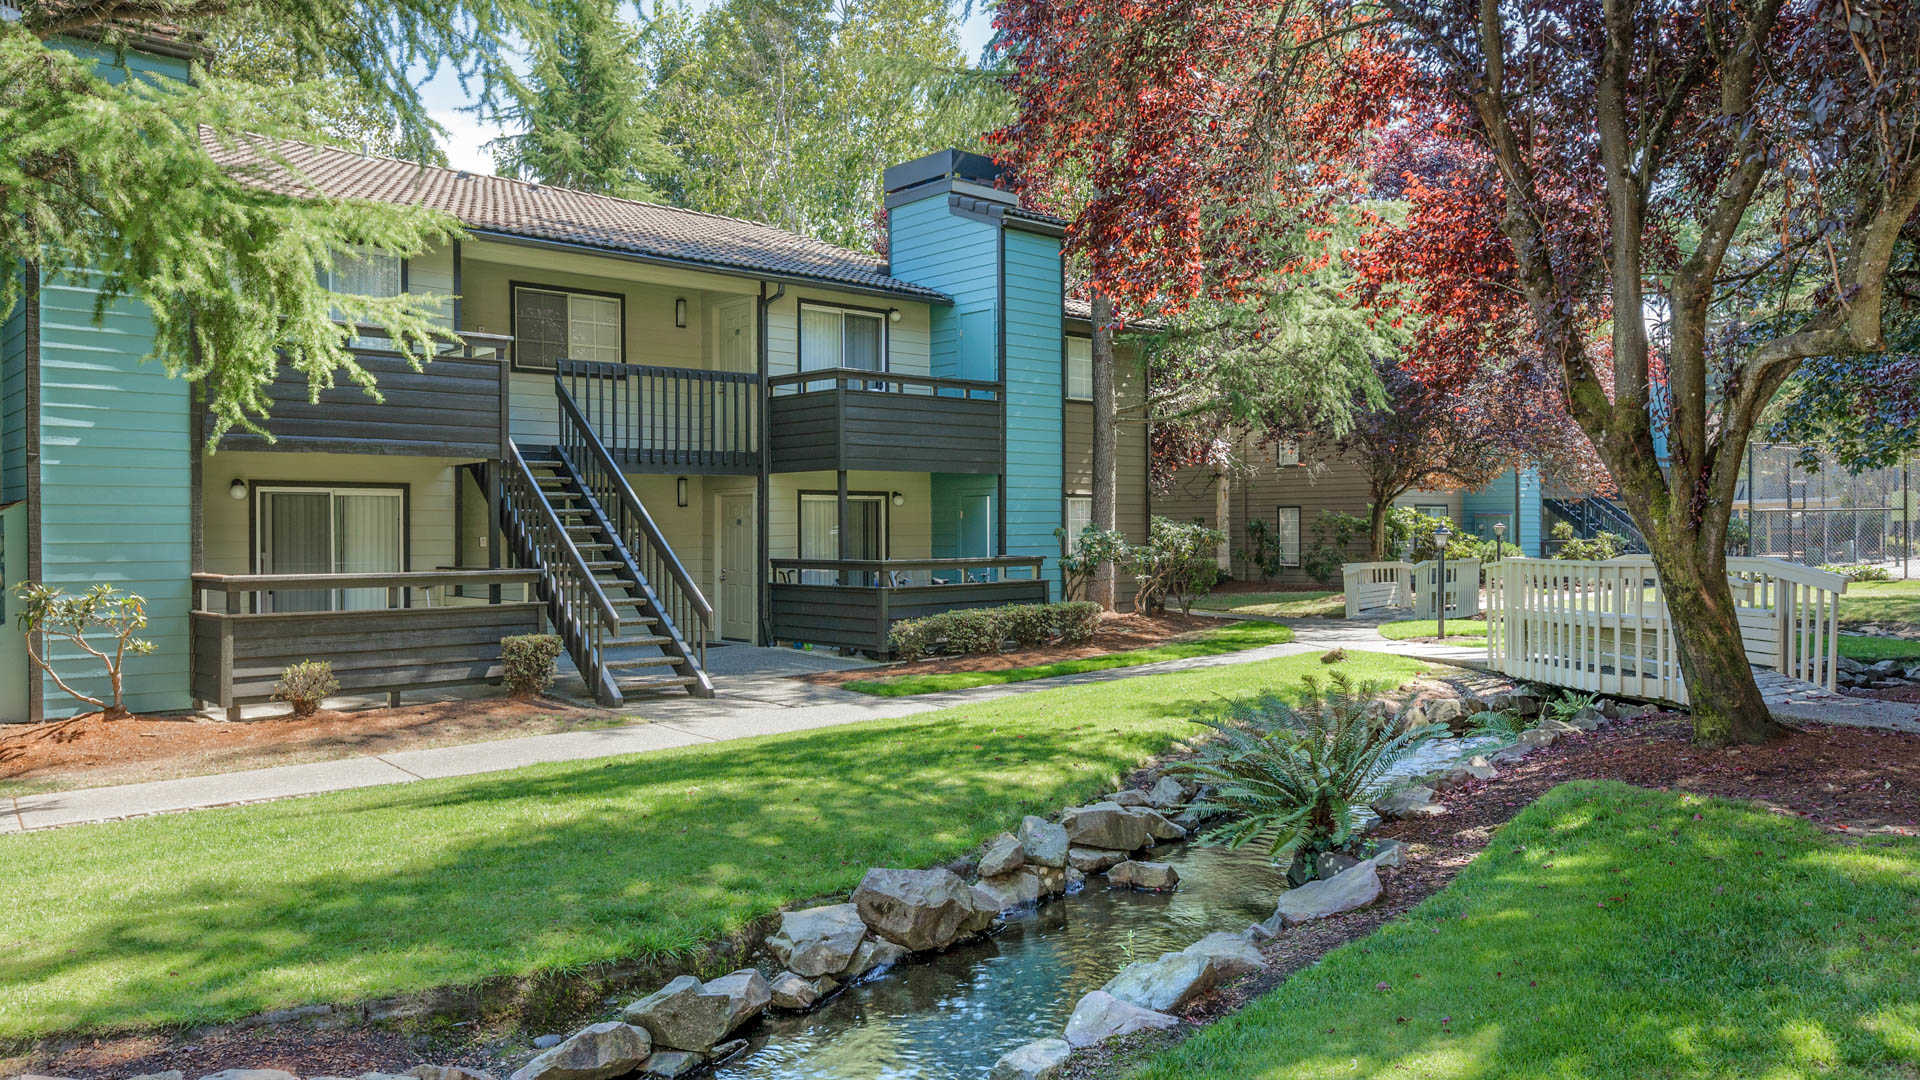 Surrey Downs Apartments